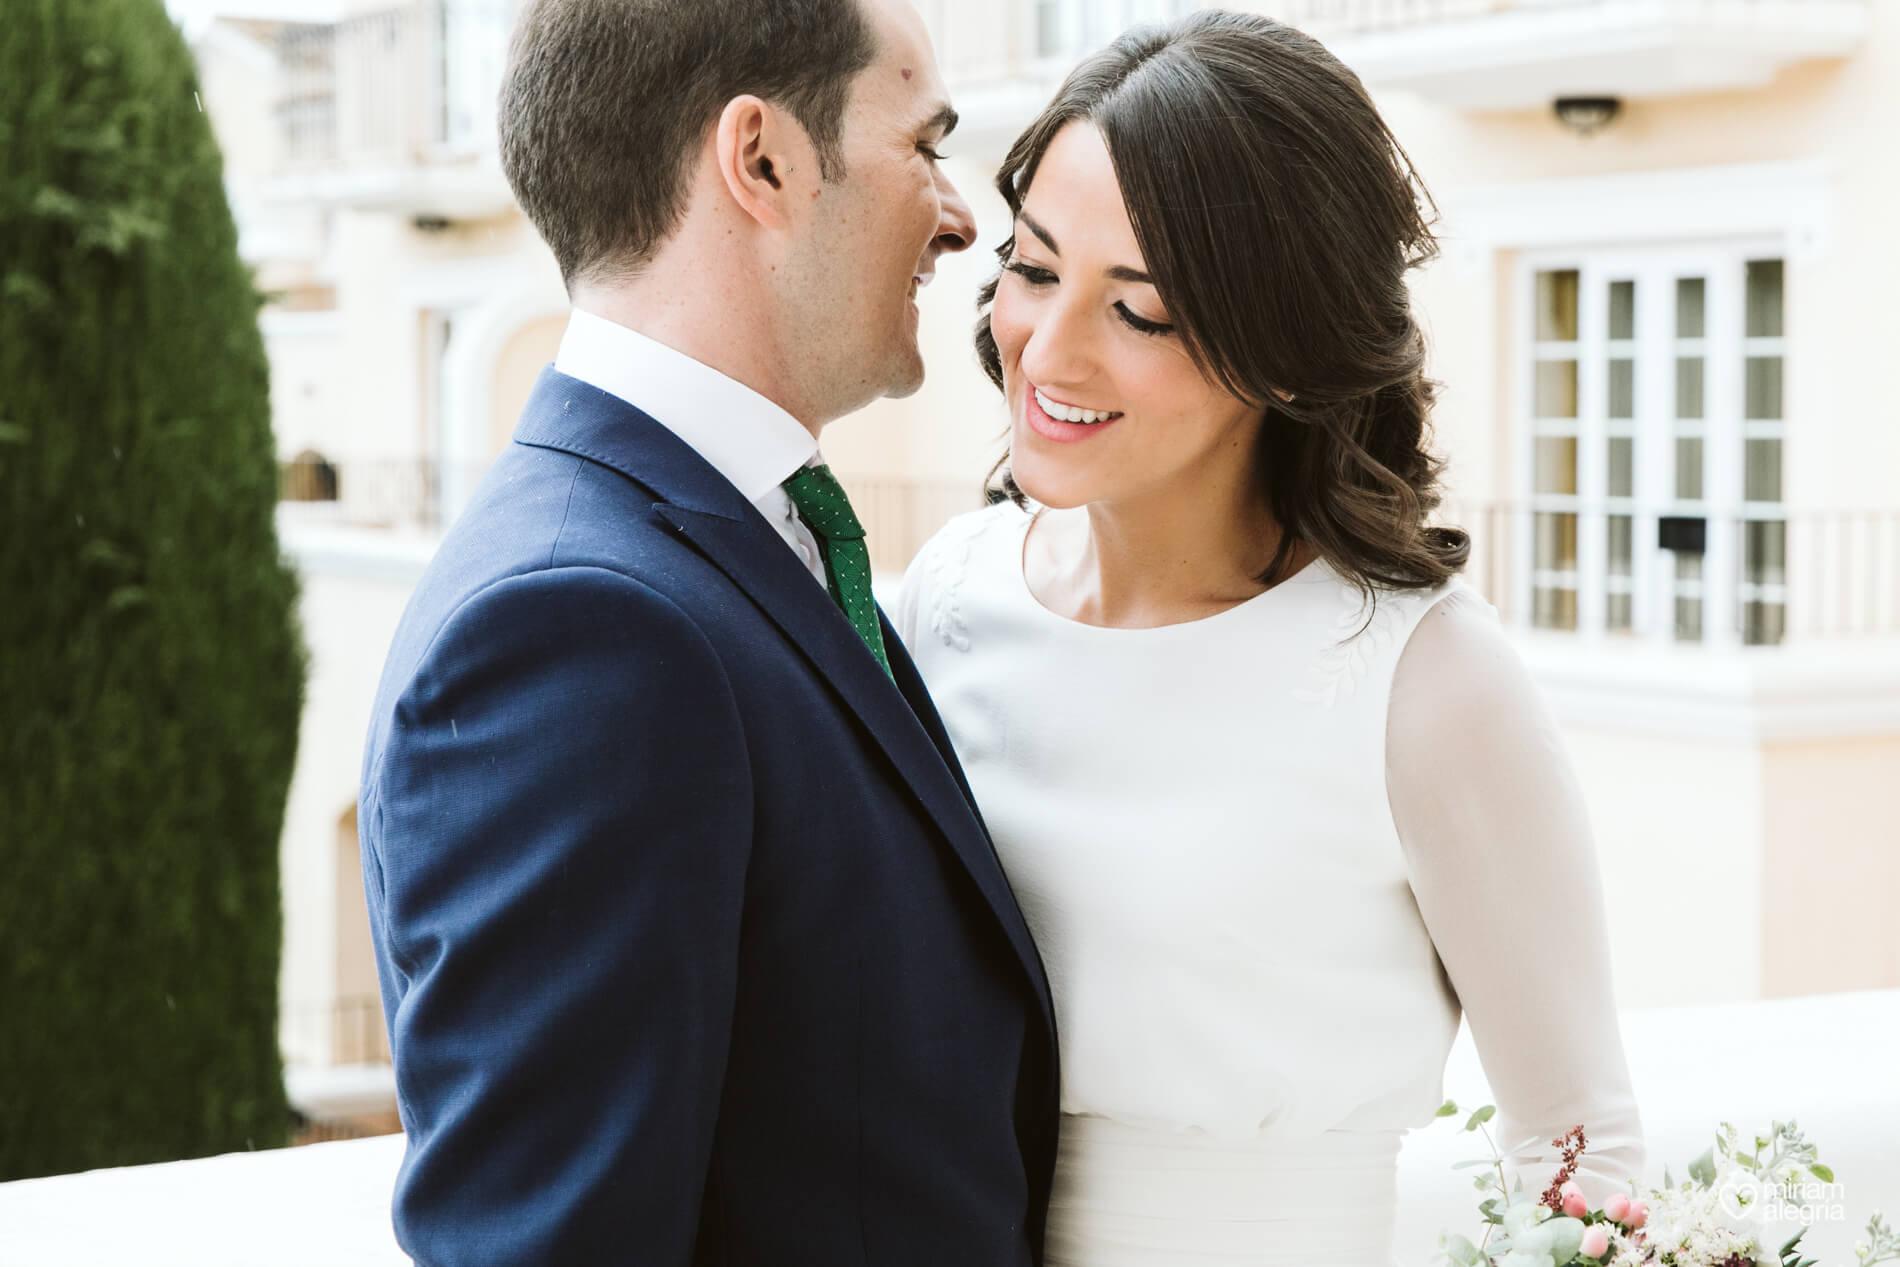 boda-en-iglesia-del-carmen-cartagena-125